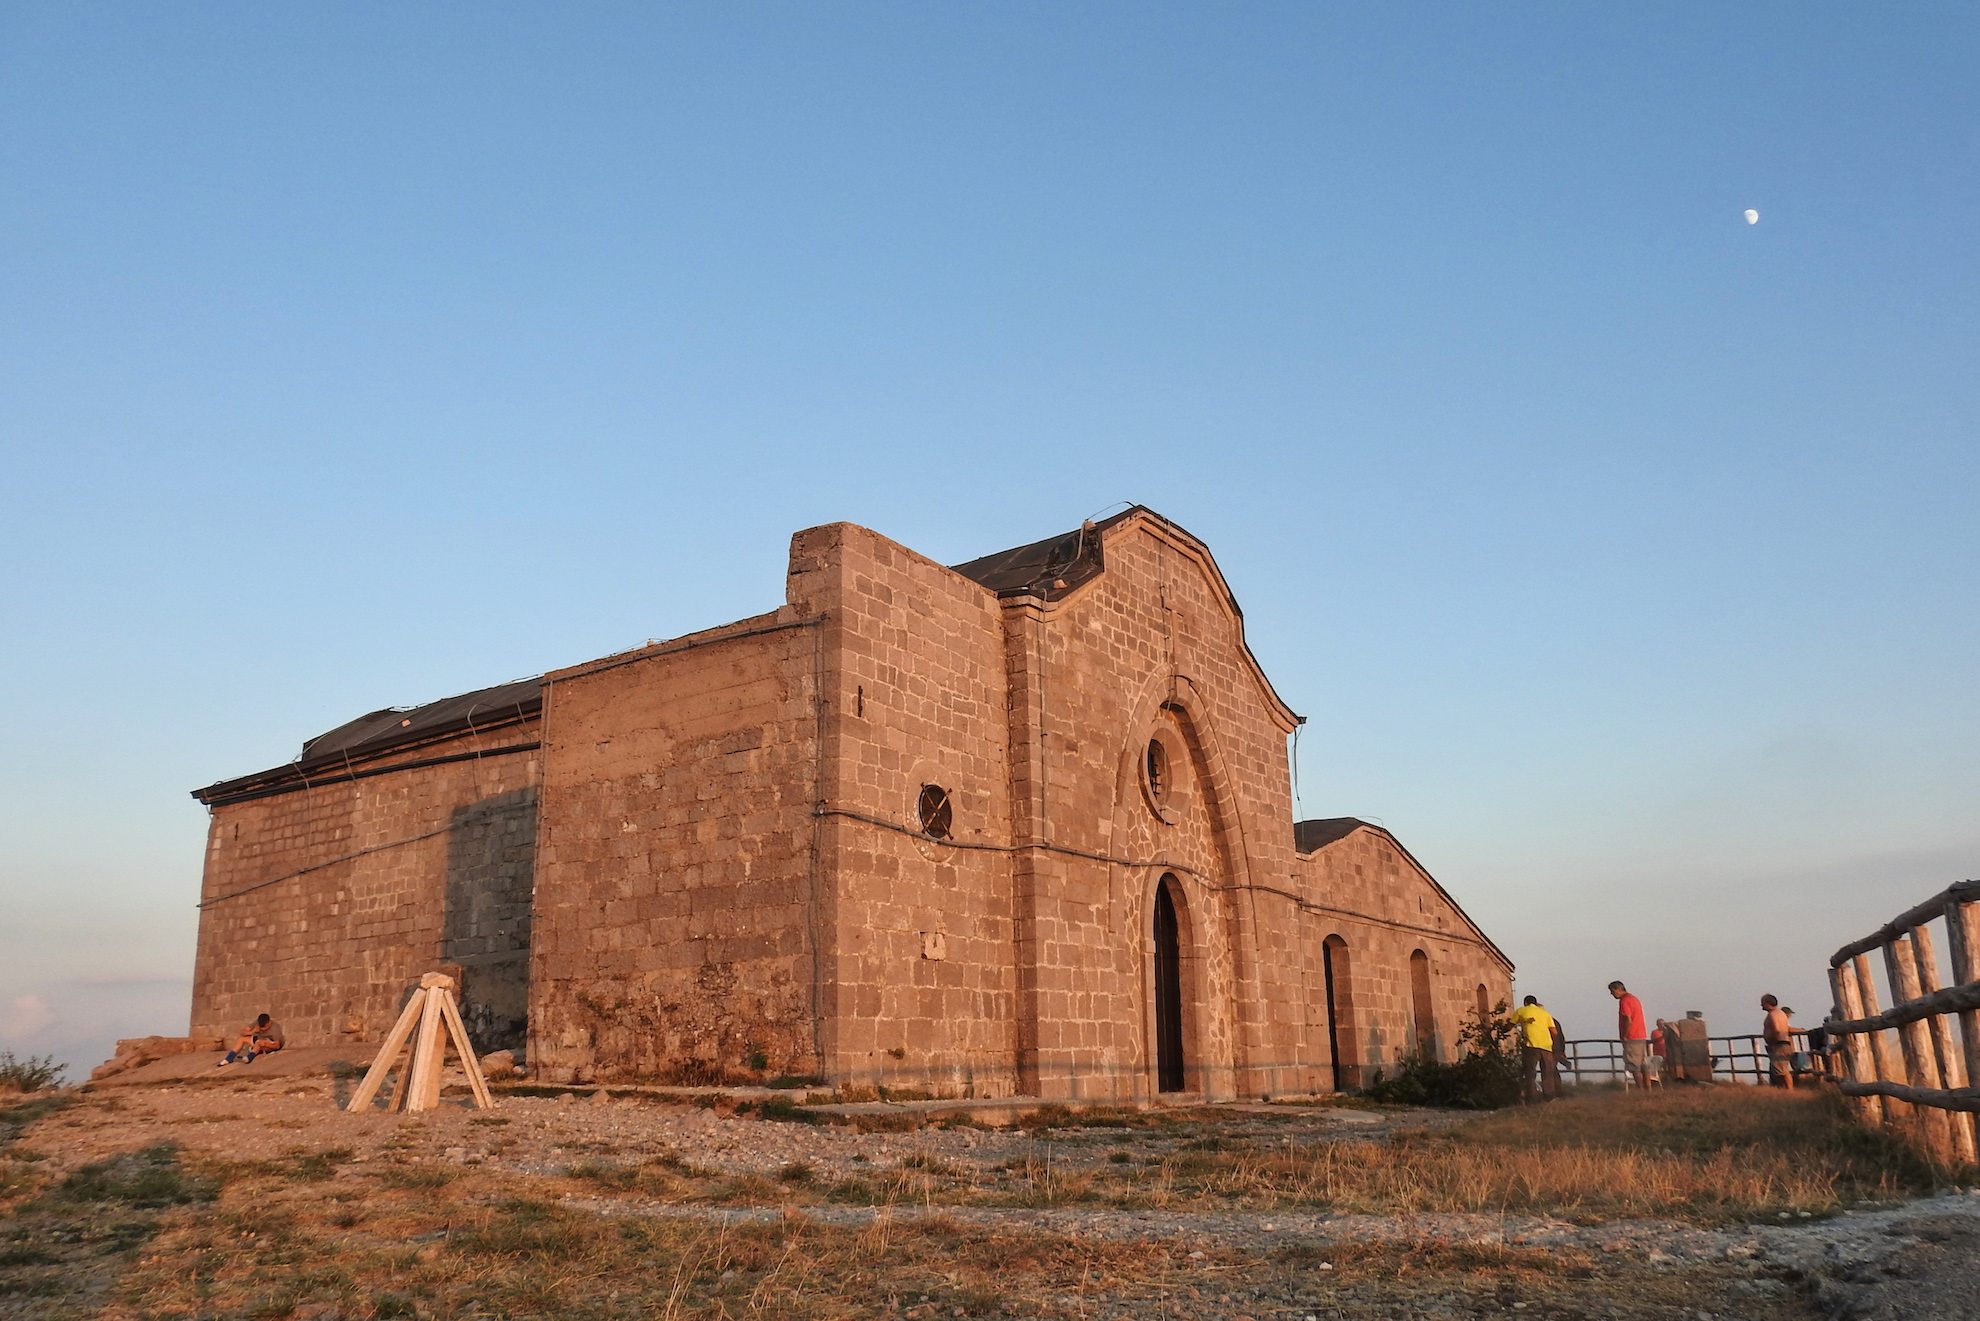 the sanctuary of St. Michael   Ph. Raffaele Imondi - trentaremi